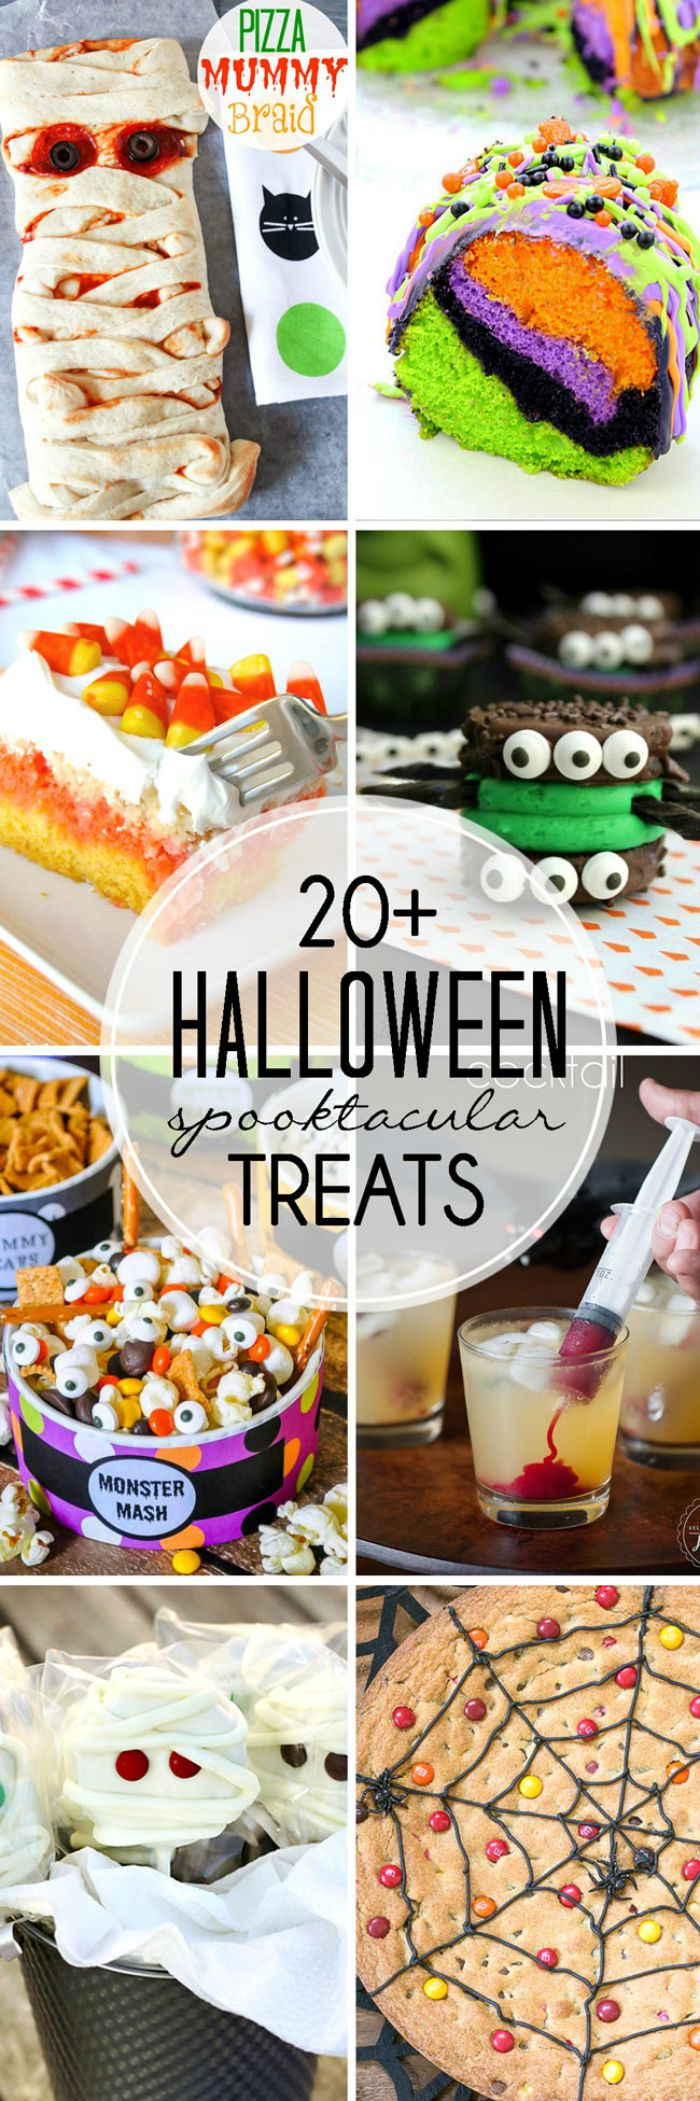 Ultimate List of SPOOKTACULAR Halloween Treats